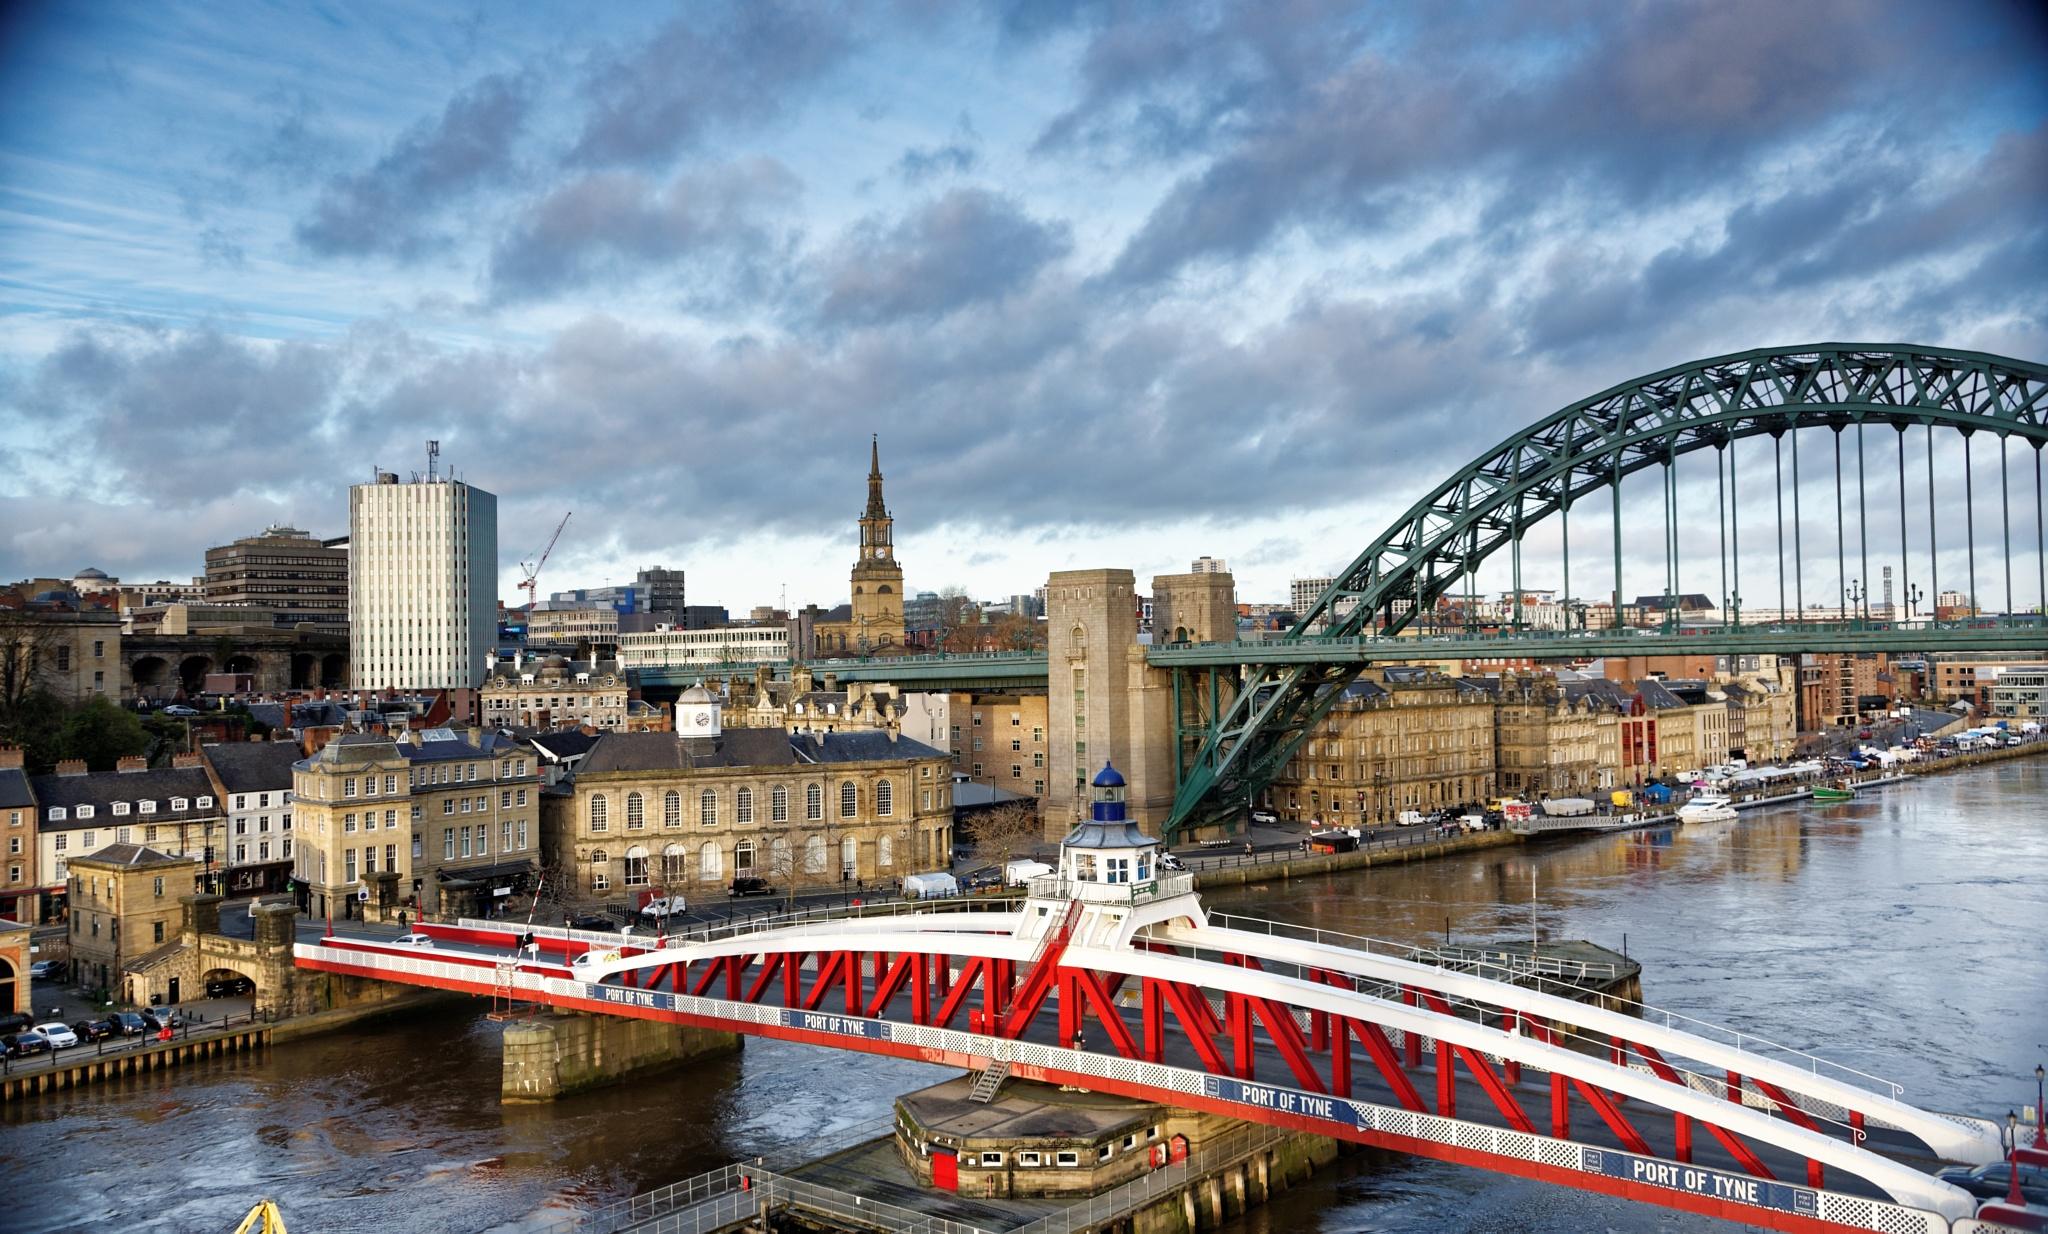 Bridges on the Tyne by Paul Collins